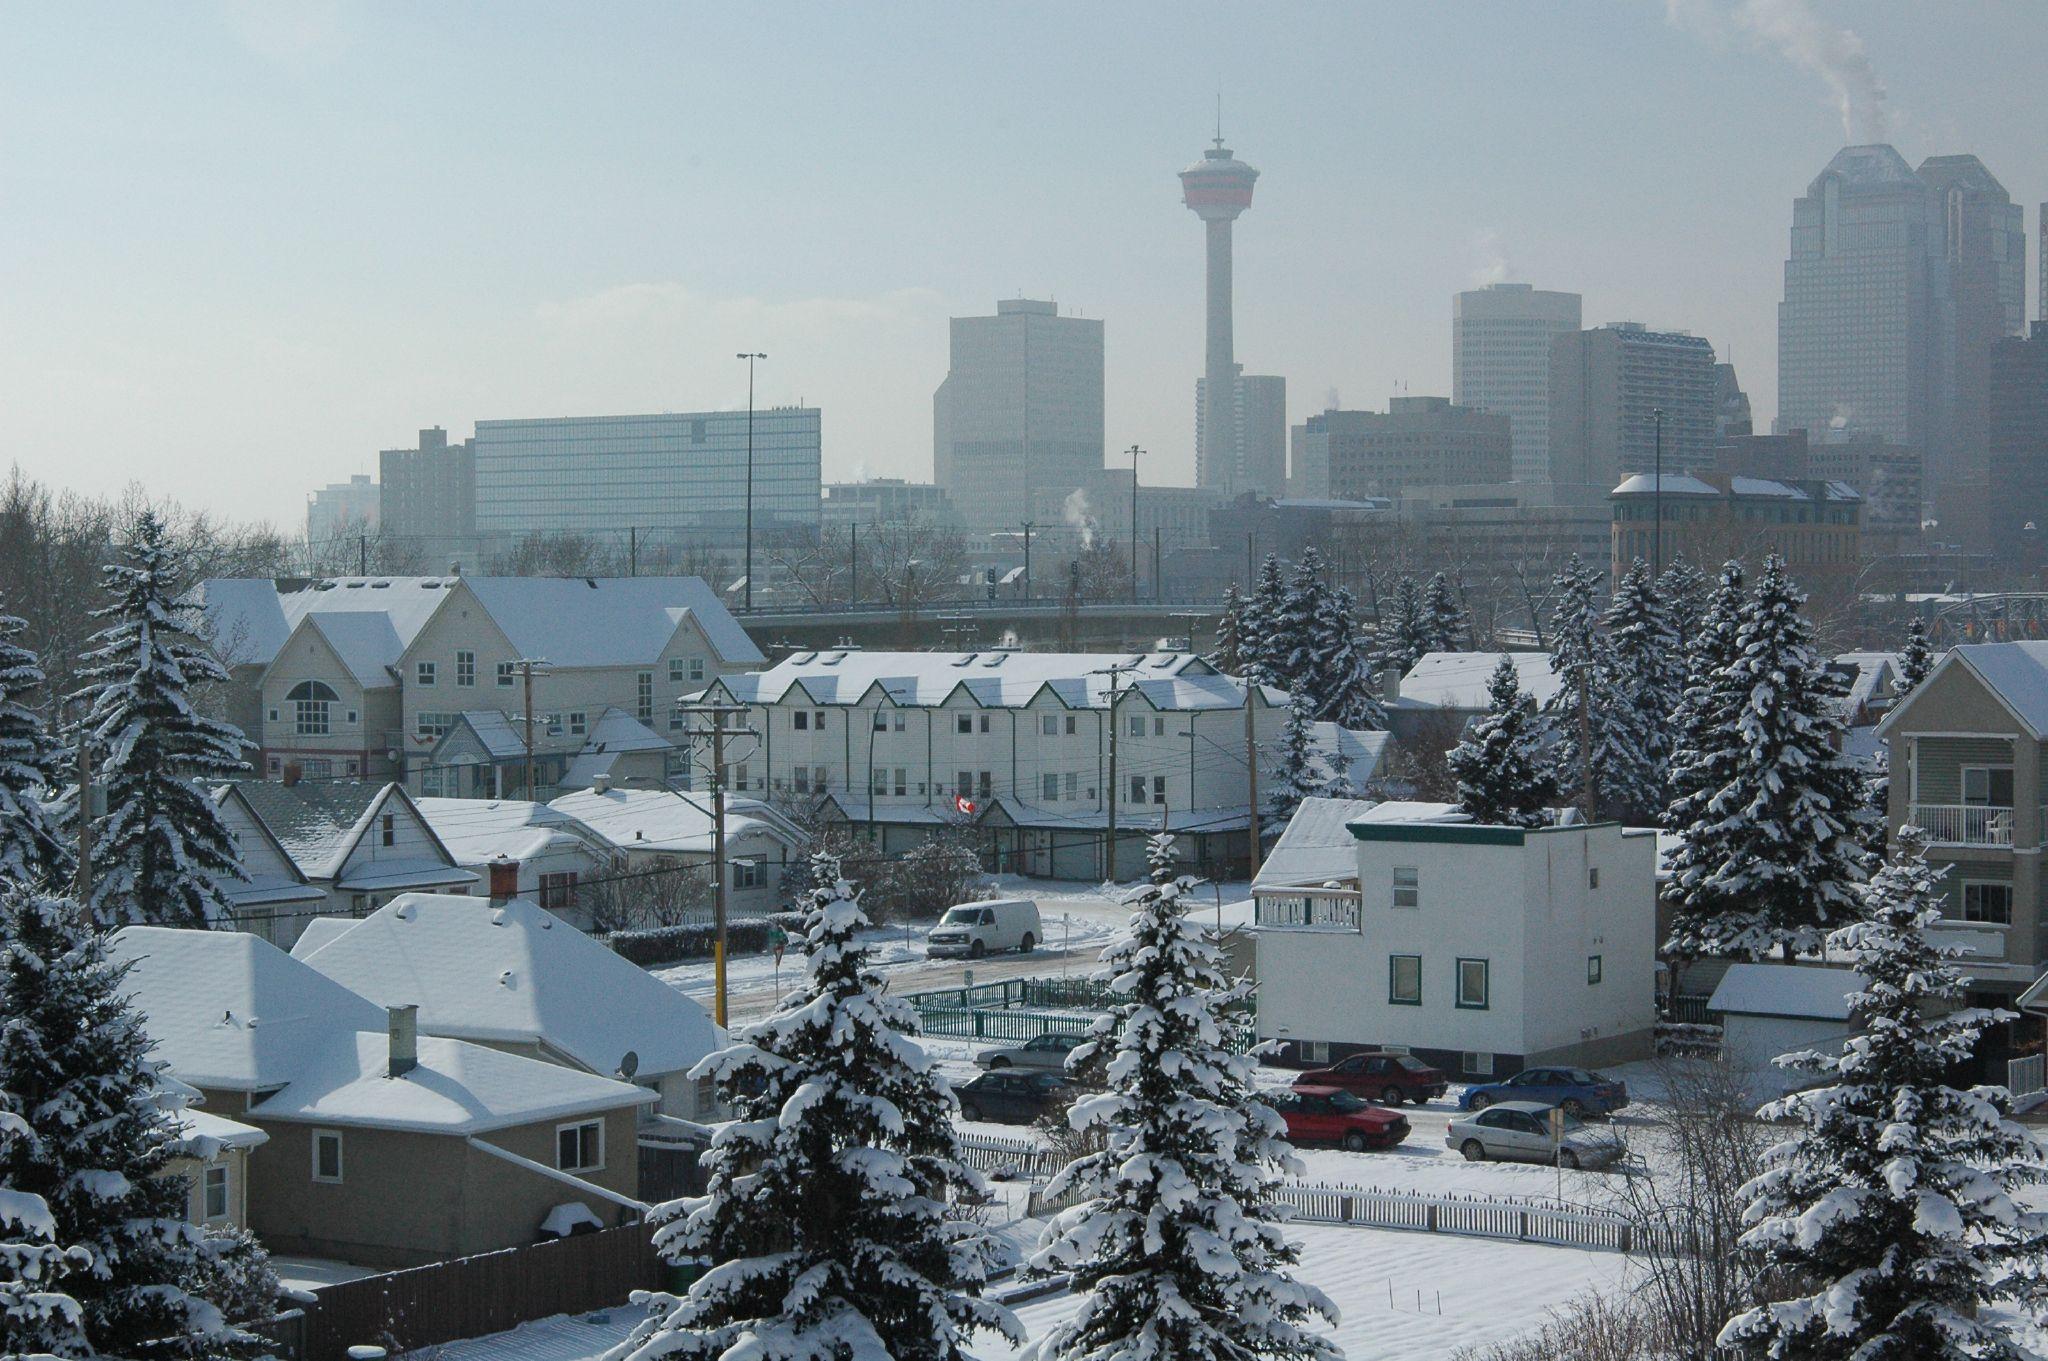 Enjoy CoOl COol Weather Of Calgary  CANADA